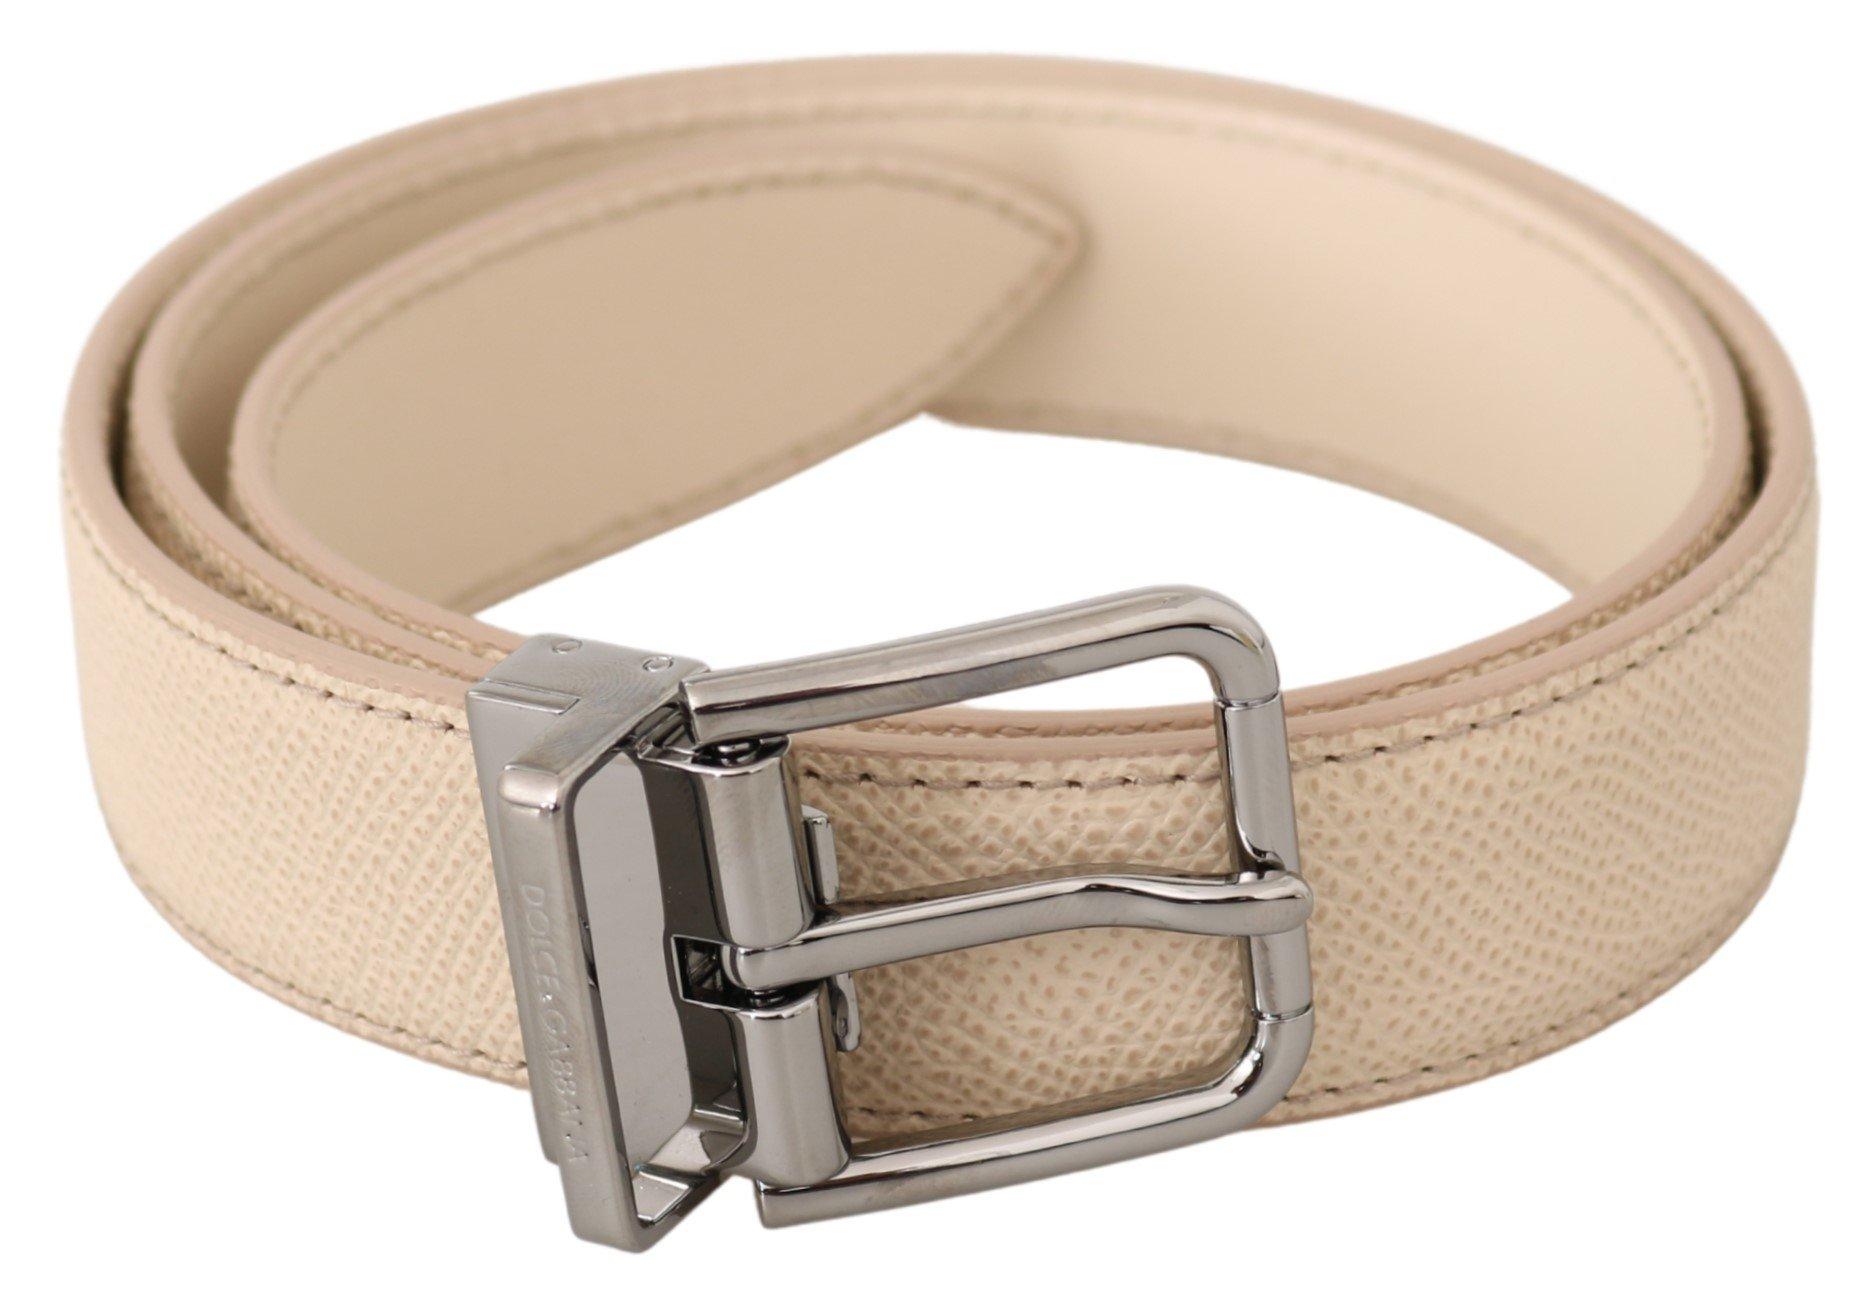 Dolce & Gabbana Men's Solid Leather Buckle Belt BEL60487BG - 75 cm / 30 Inches